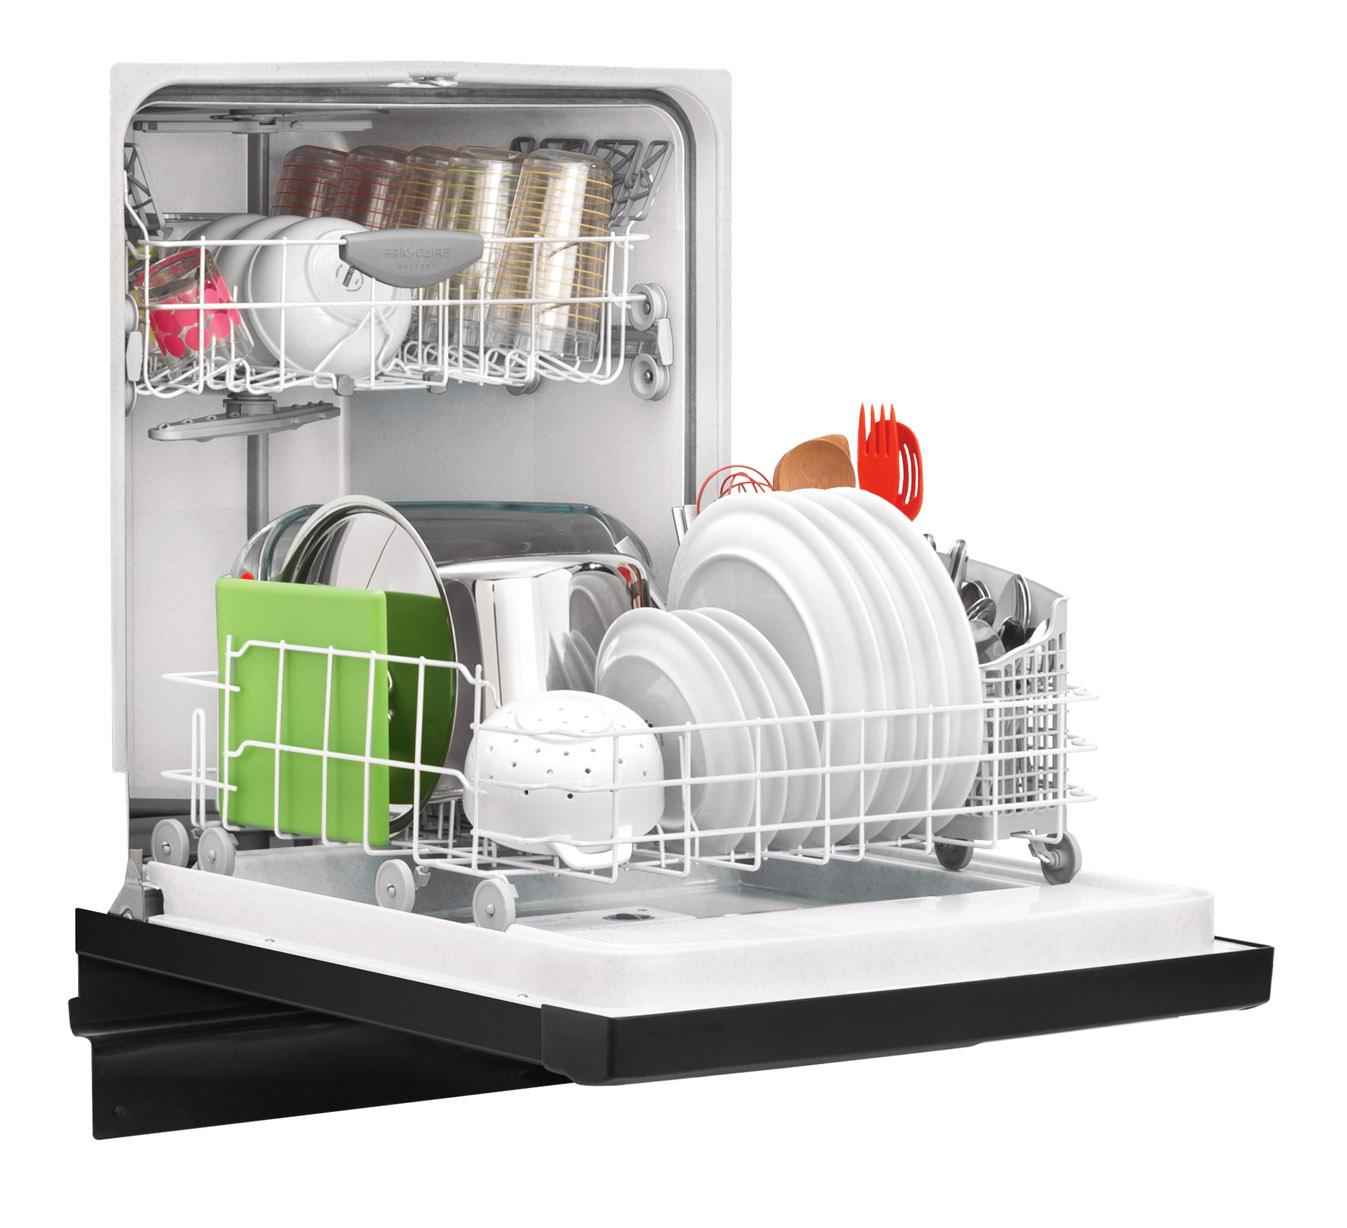 "Frigidaire Gallery Gallery 24"" Built-In Dishwasher w/ Nylon Racks - Black"